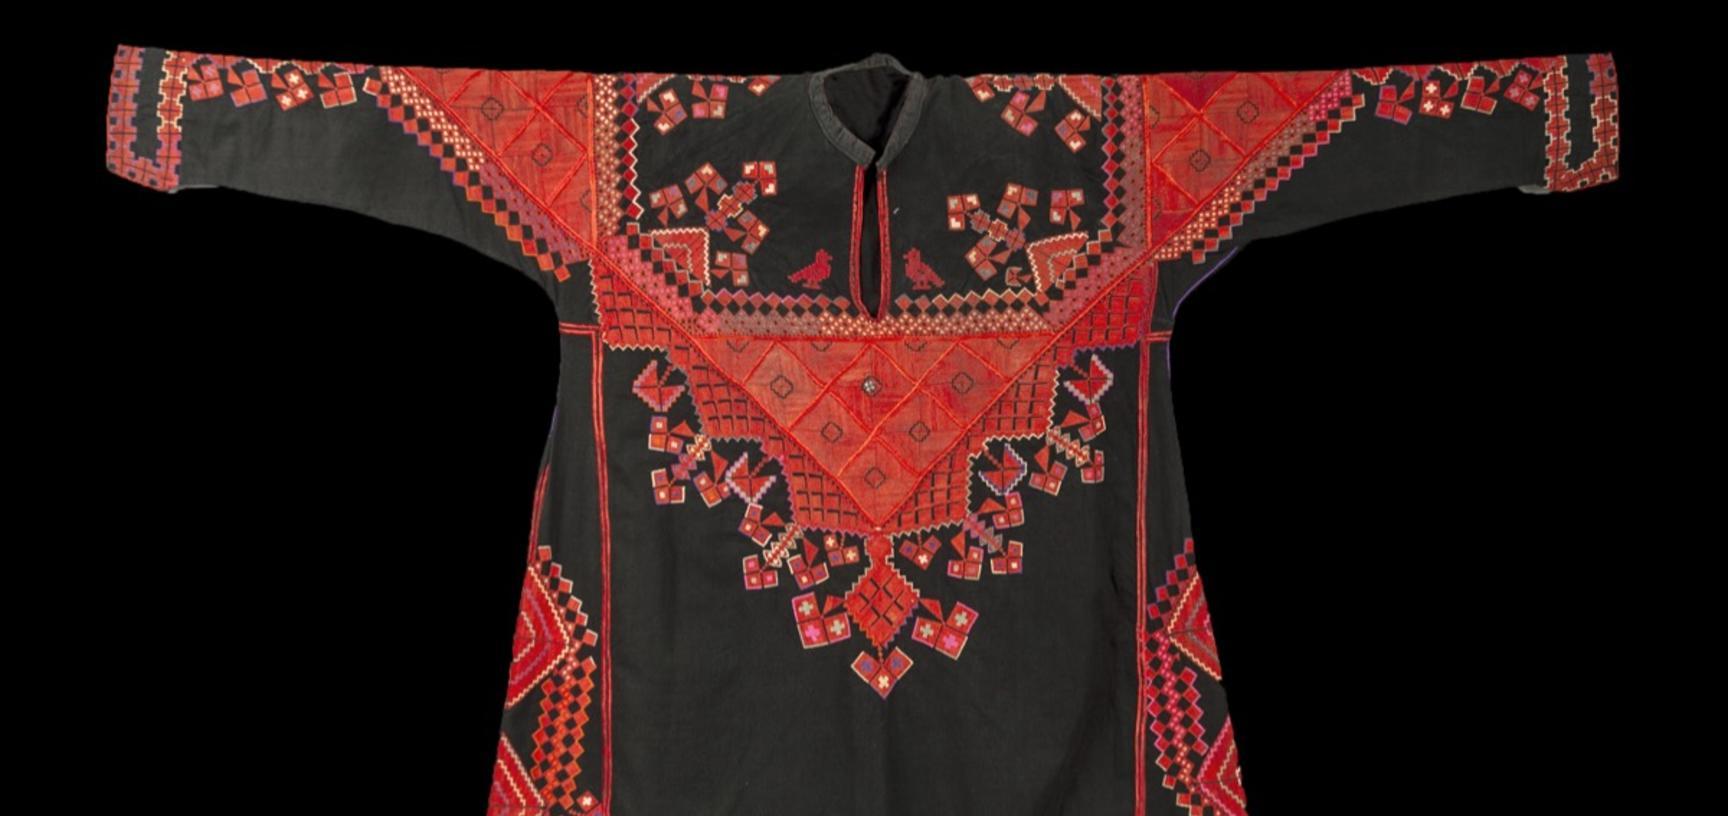 Embroidered dress (front). Saraqib, Syria. Mid-twentieth century.